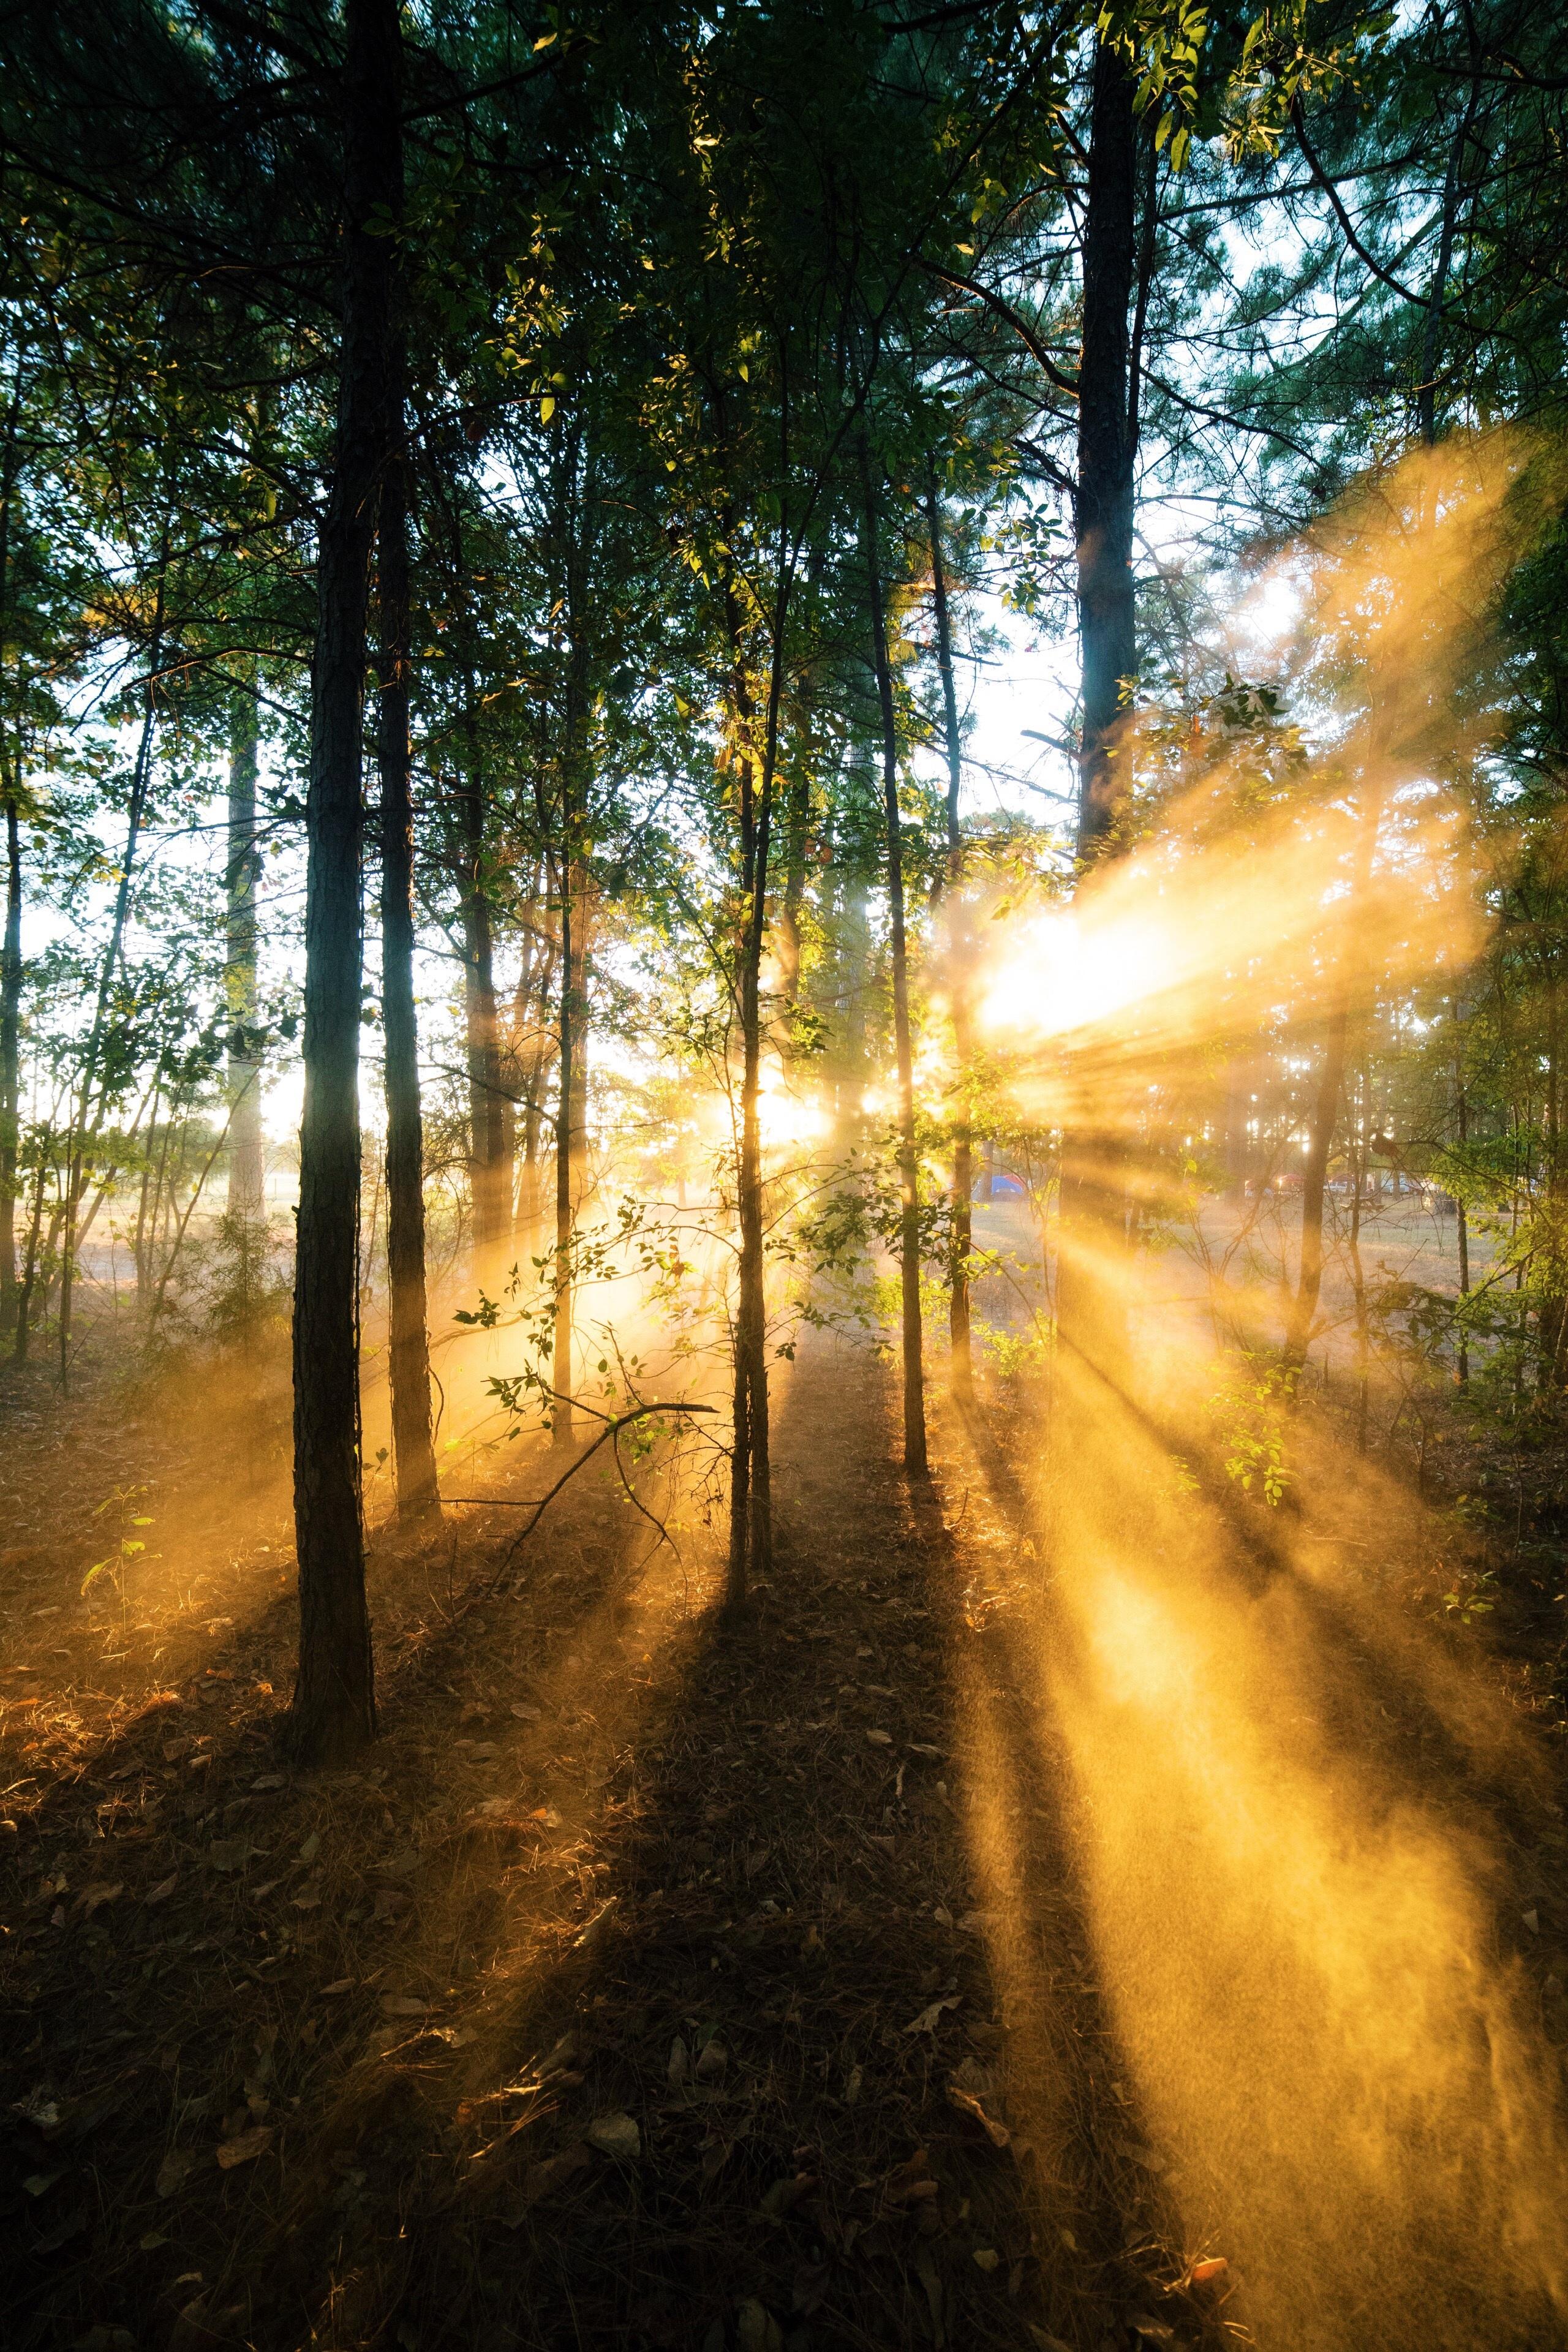 sun fog sunrise trees - photo #14